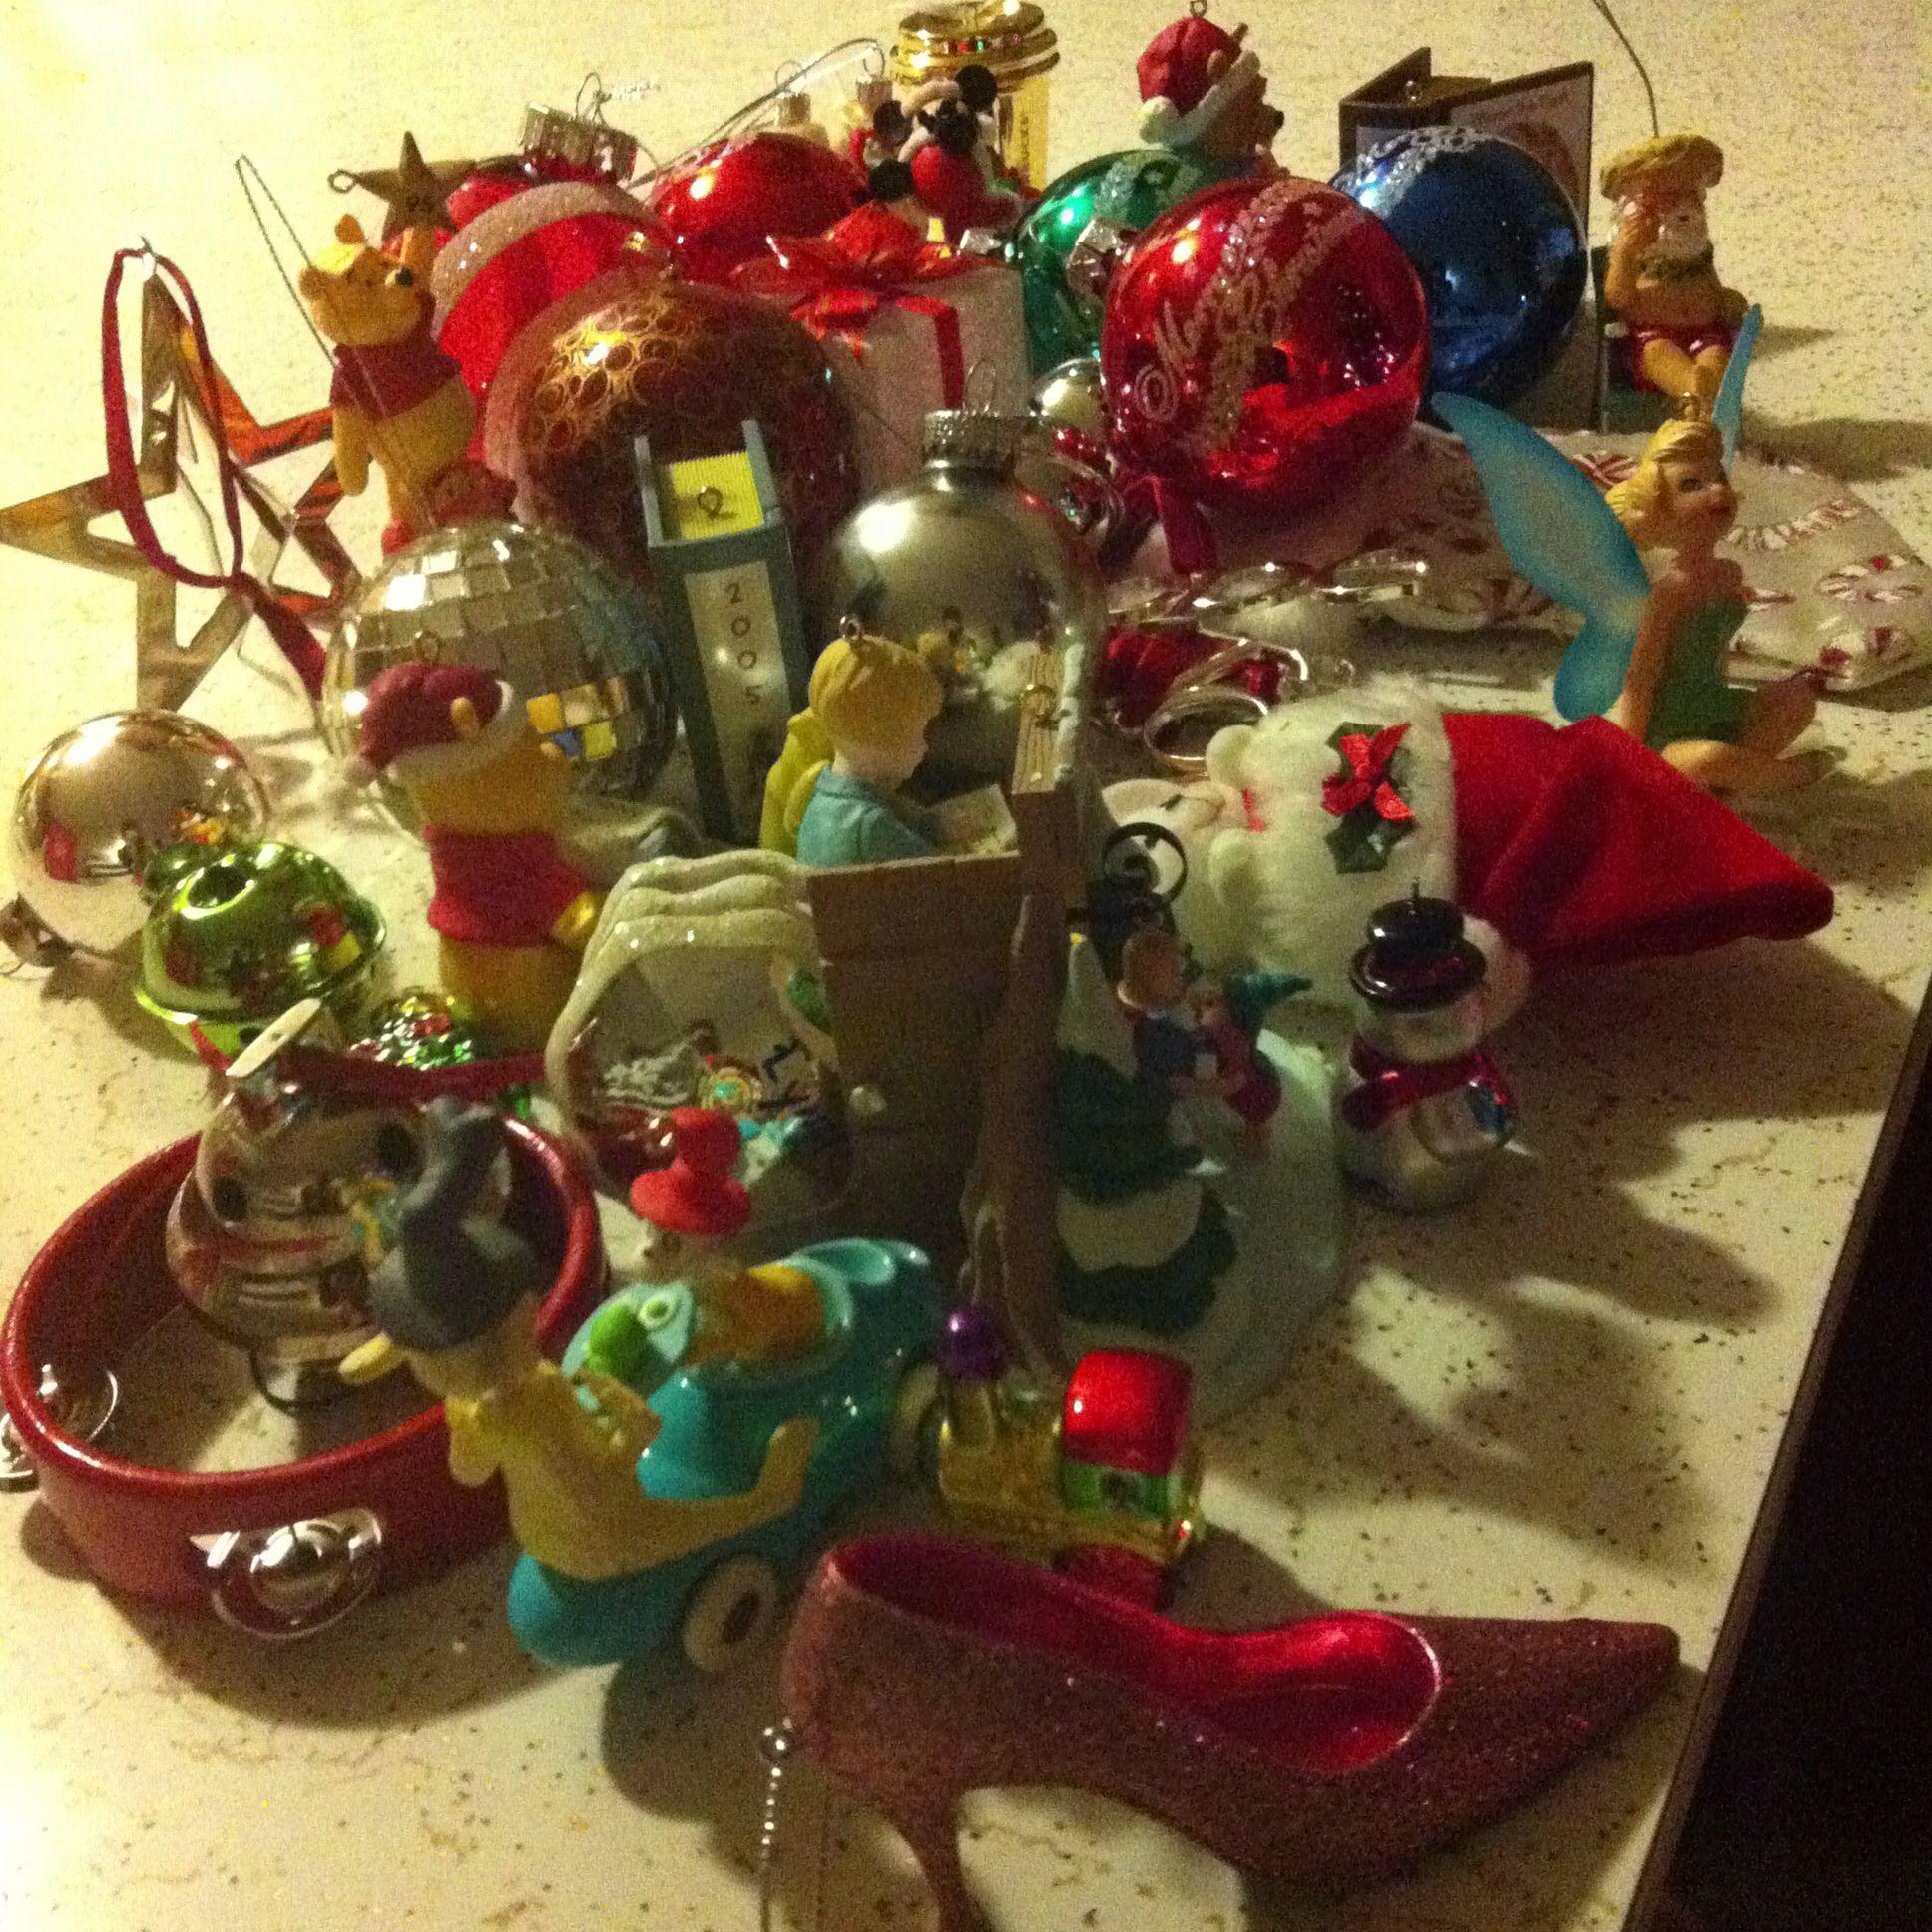 The end of Christmas 2012